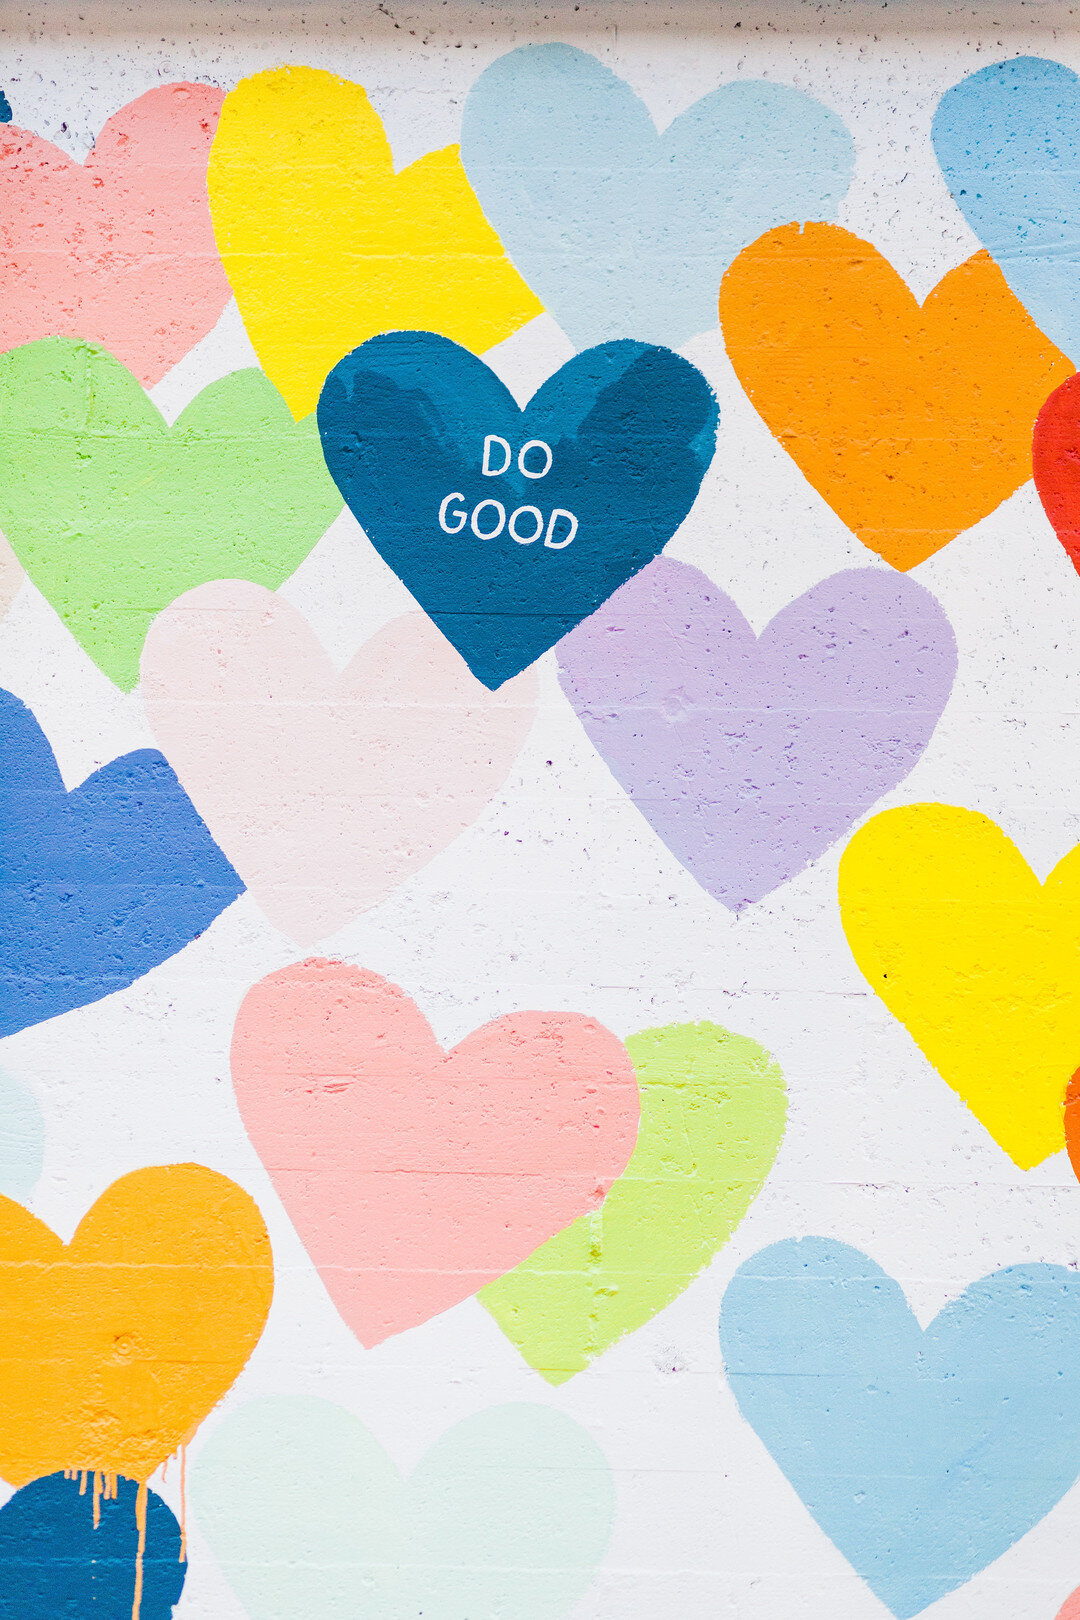 Do good heart wall